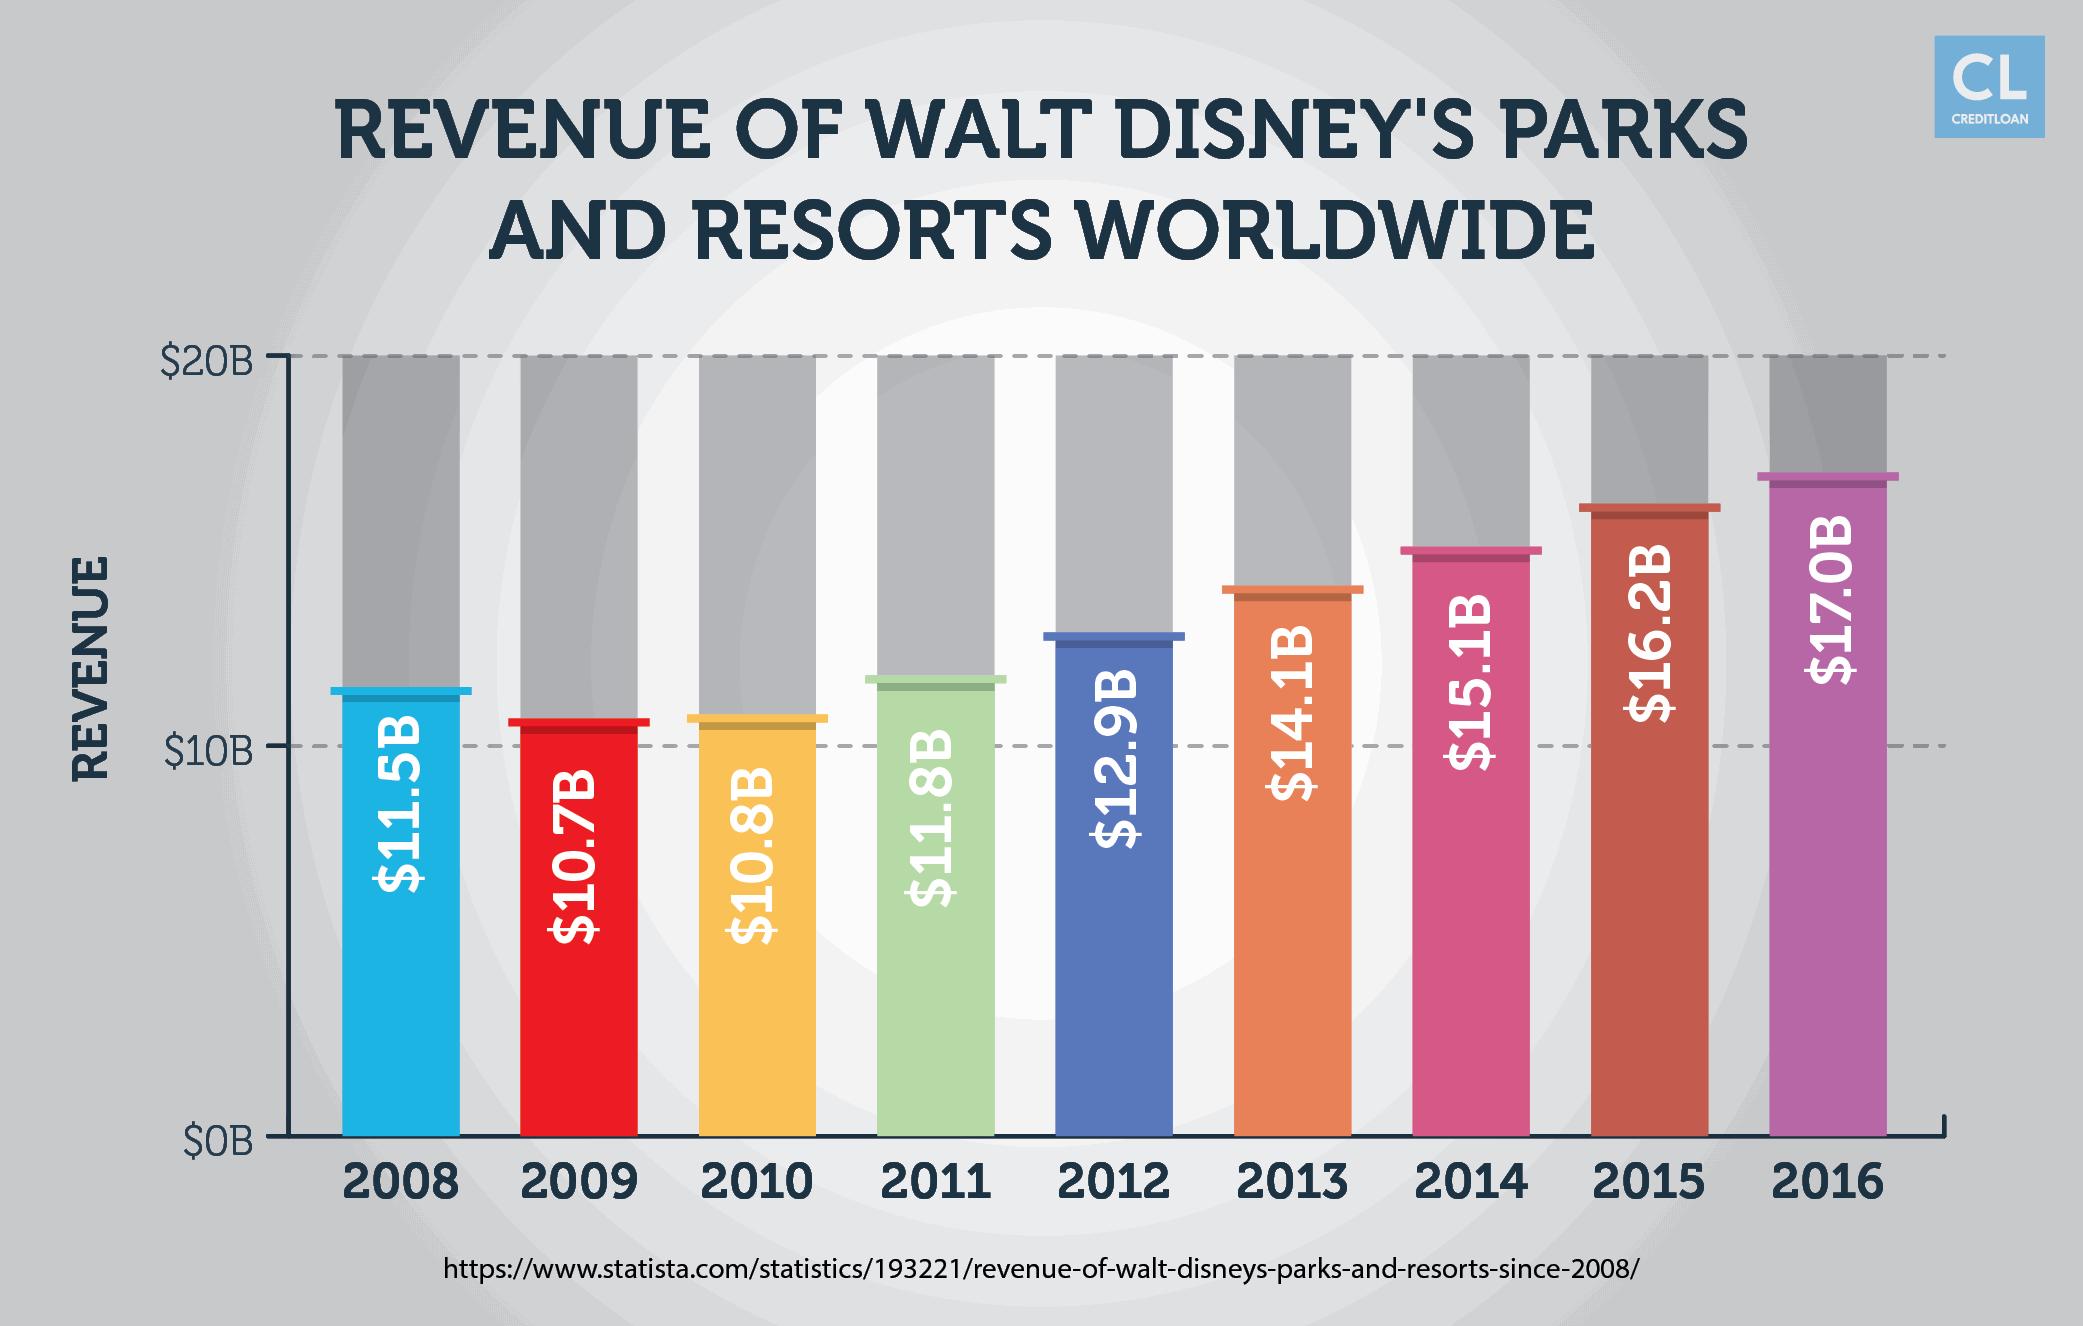 Revenue of Walt Disney's Parks and Resorts Worldwide